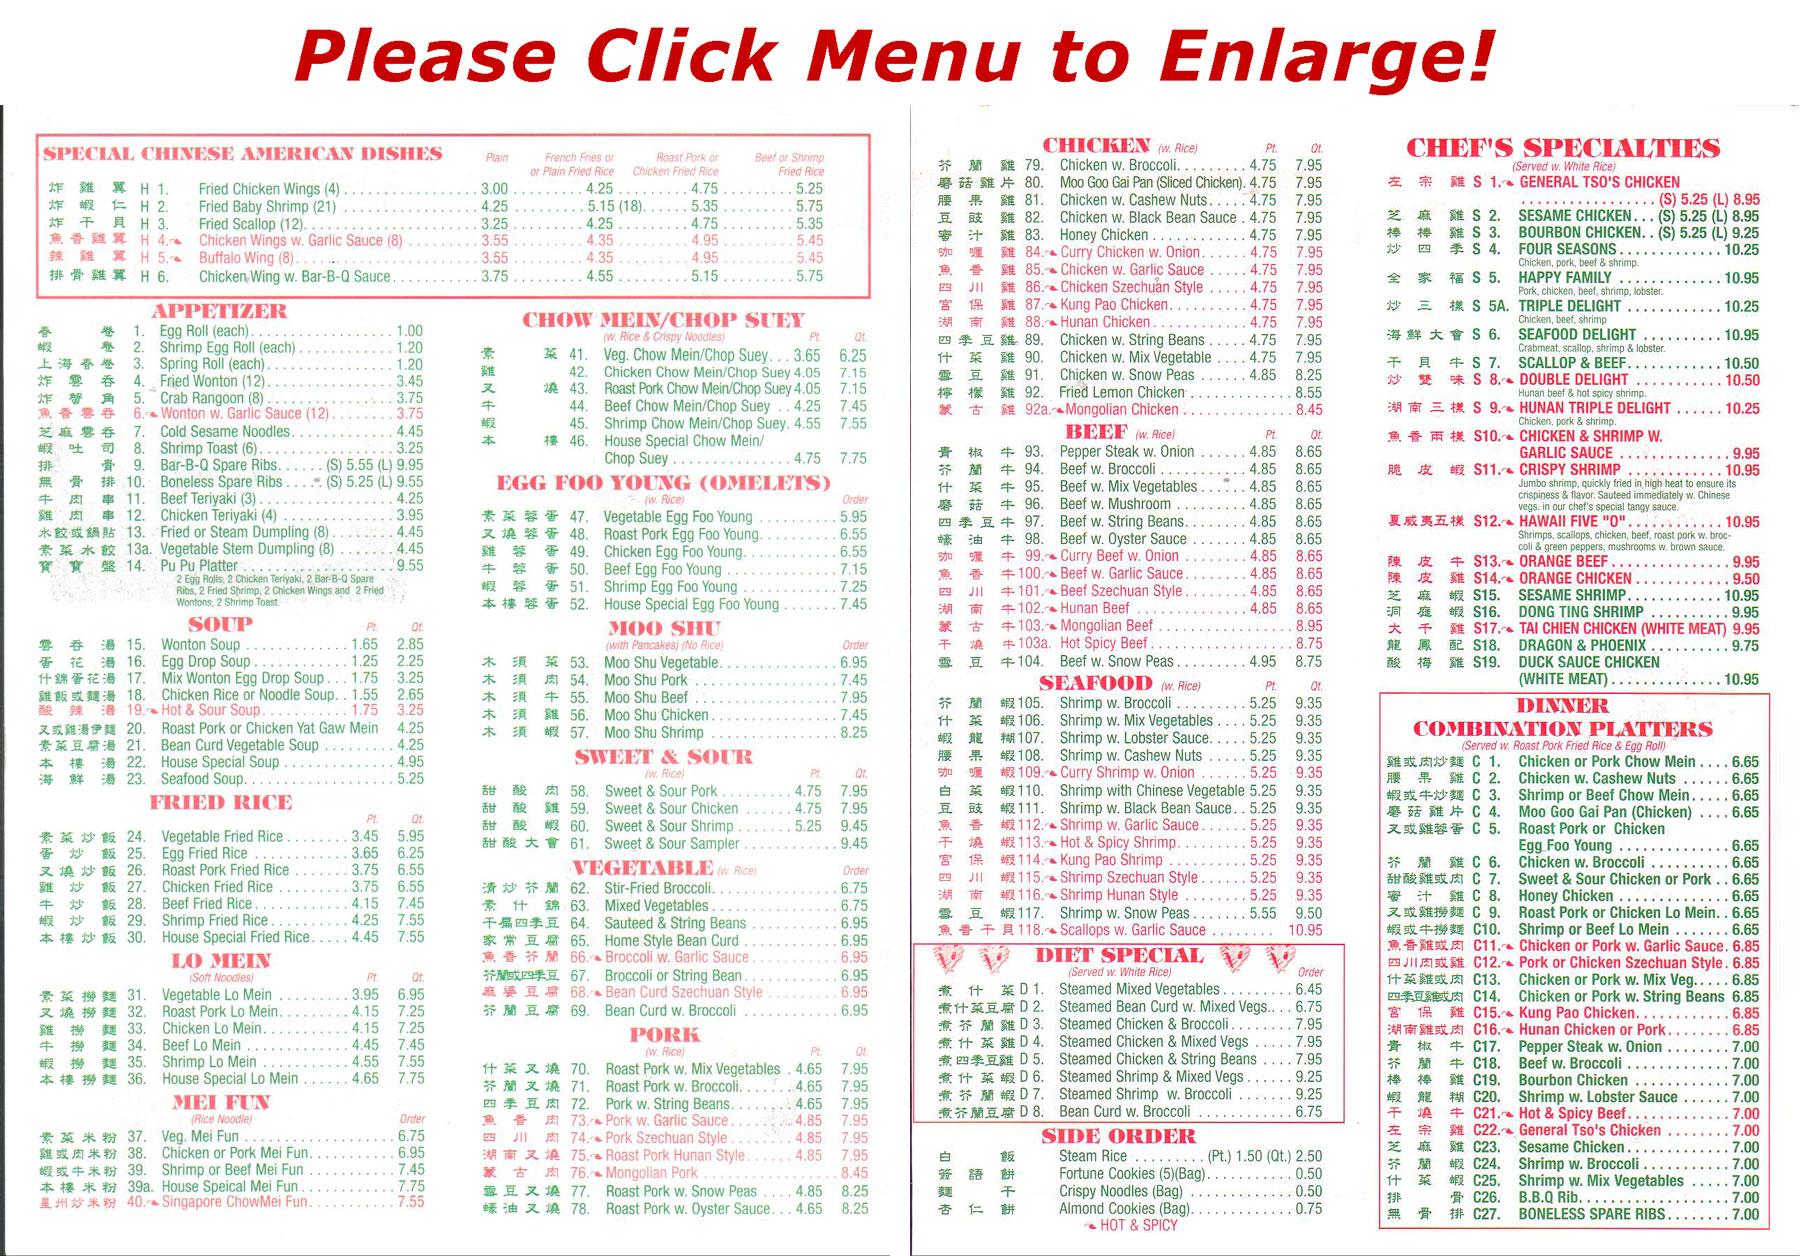 Image Gallery Hong Kong Cuisine Menu